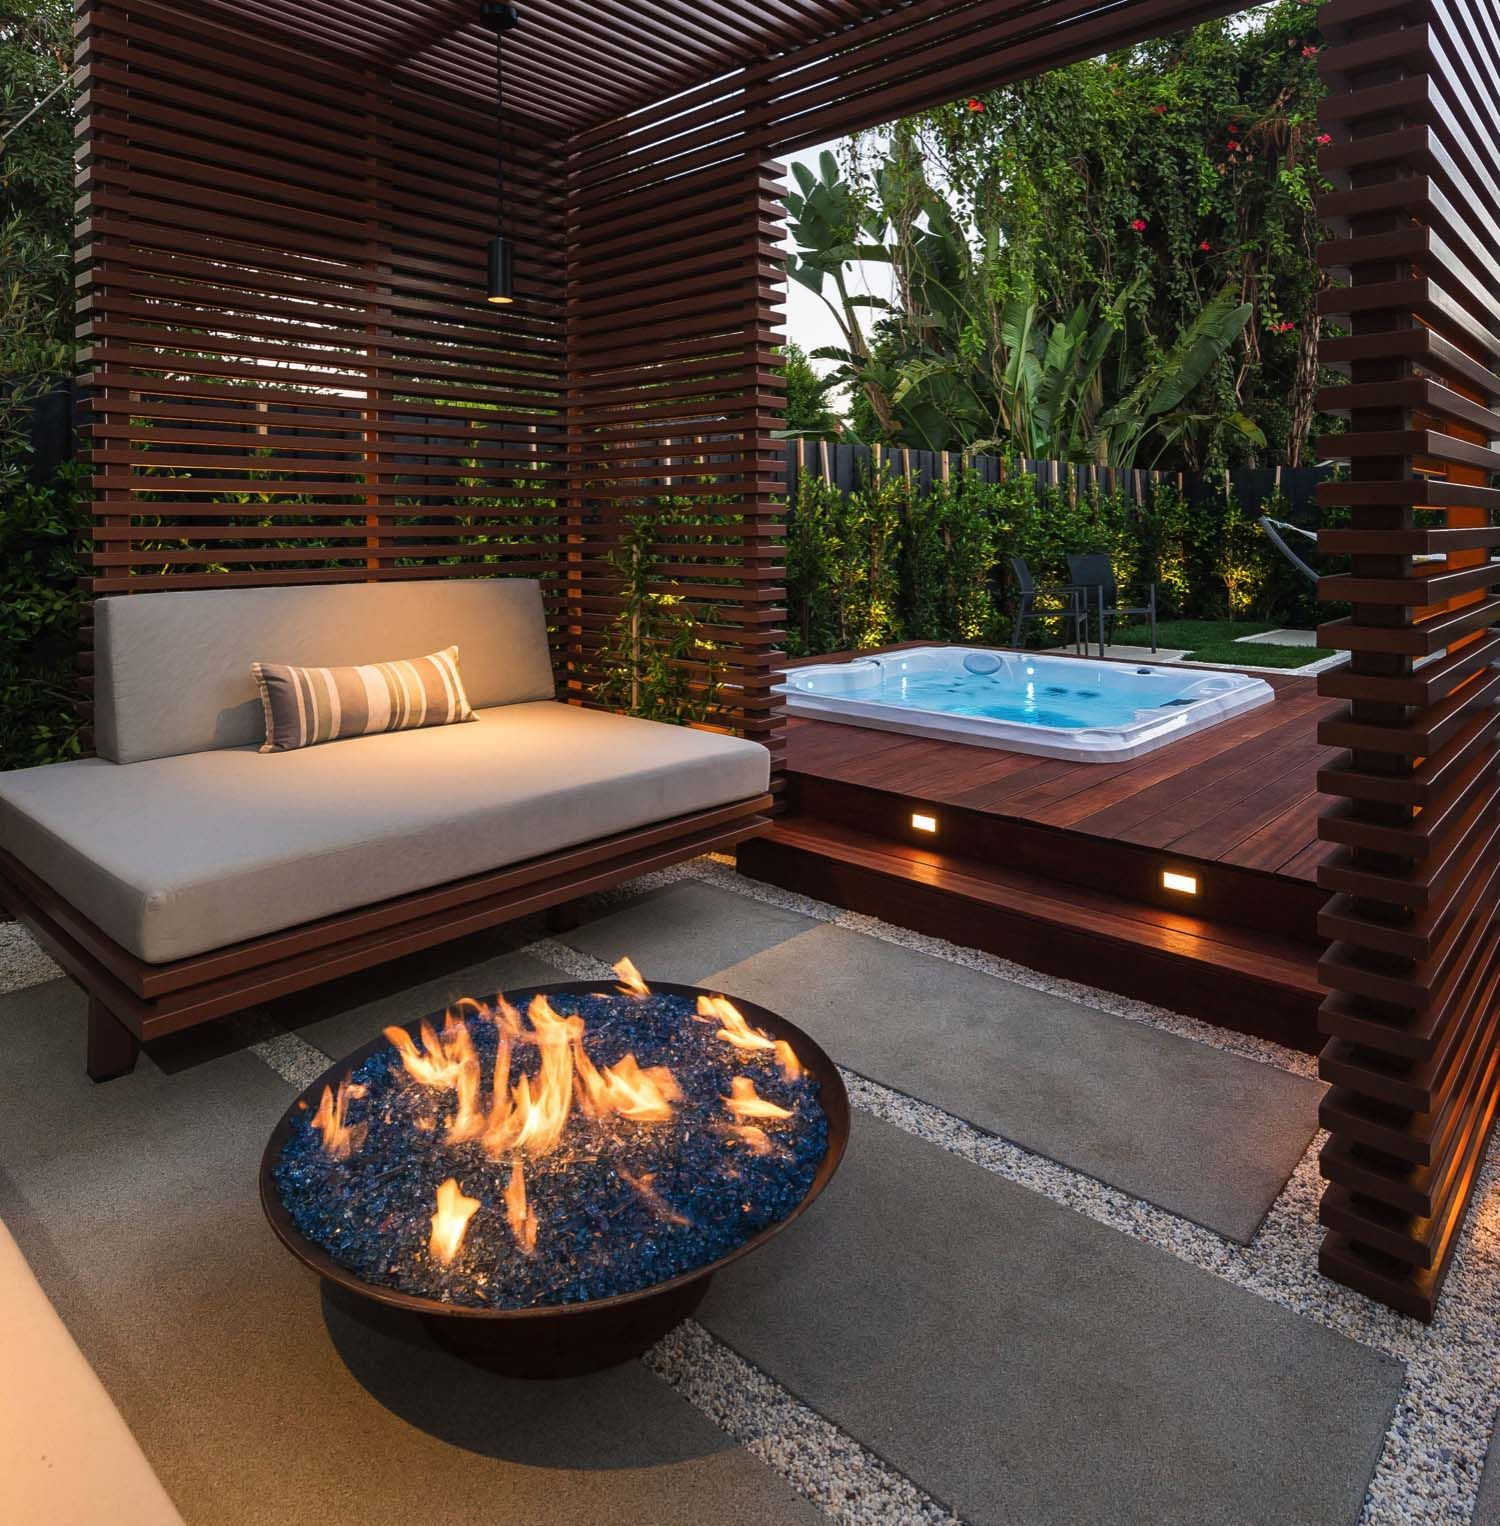 25 Amazing Ideas For Creating An Outdoor Deck For Entertaining Hot Tub Backyard Hot Tub Patio Hot Tub Gazebo Modern outdoor hot tub